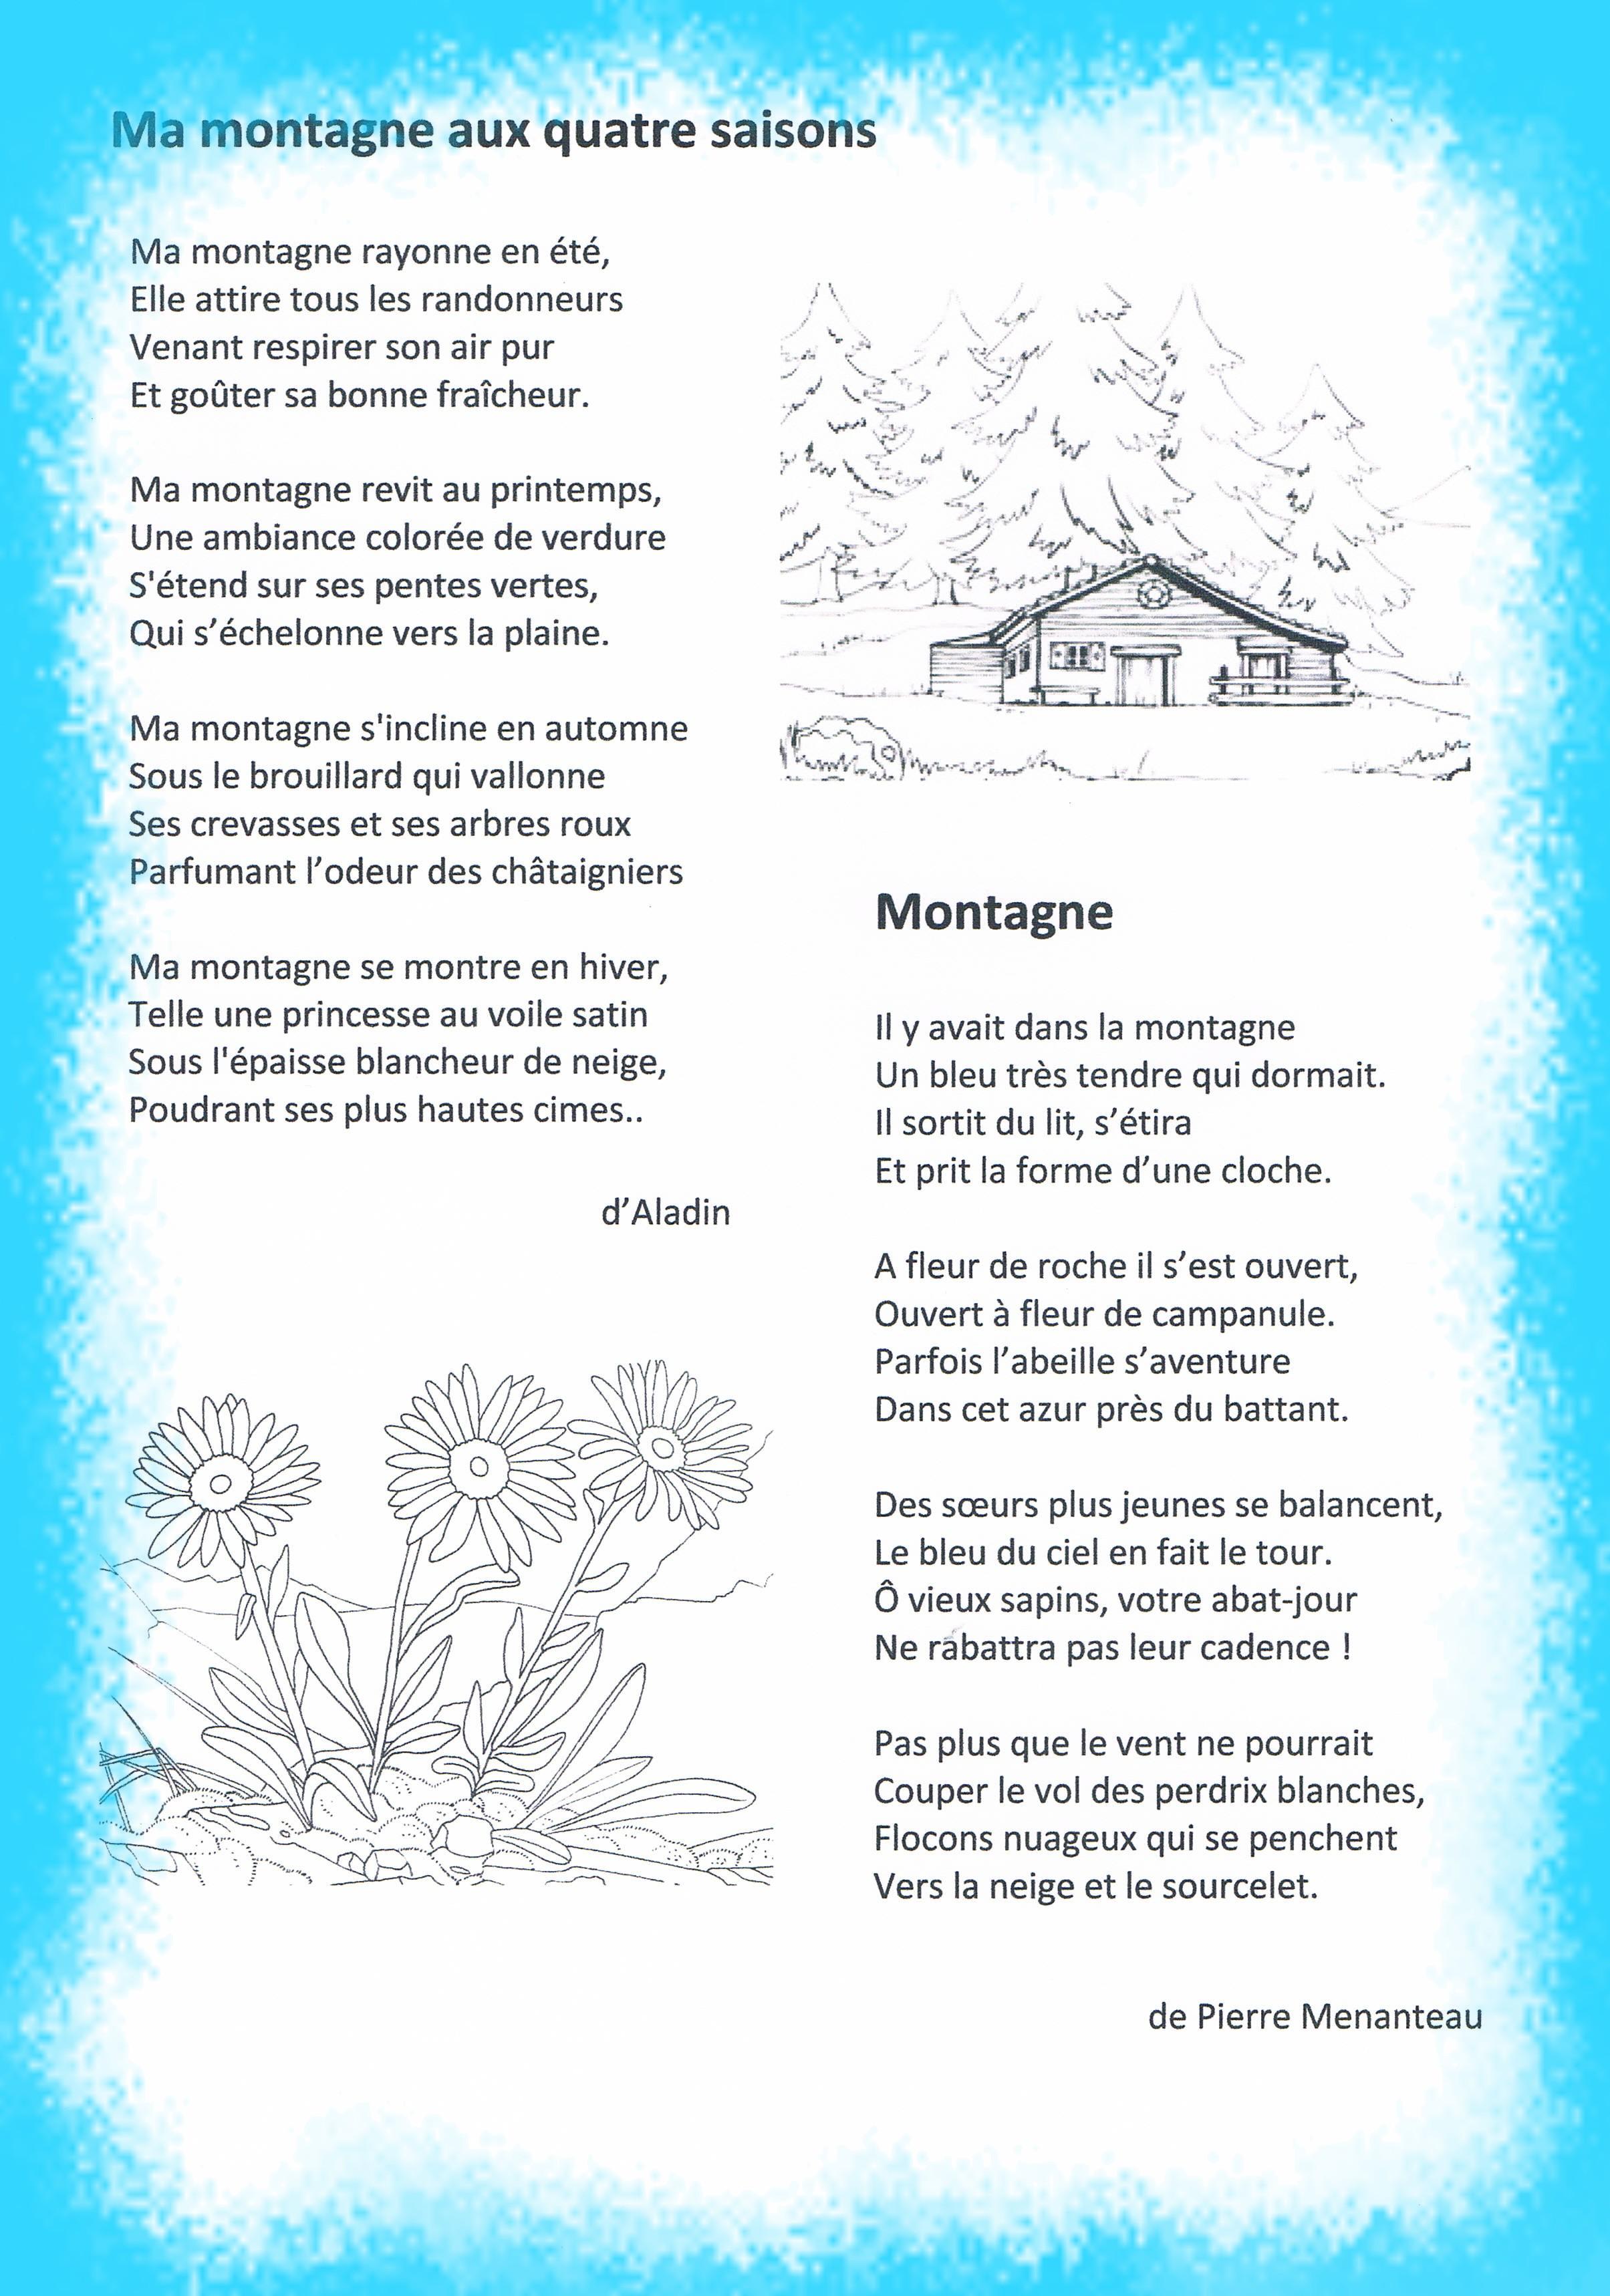 poesie theme montagne